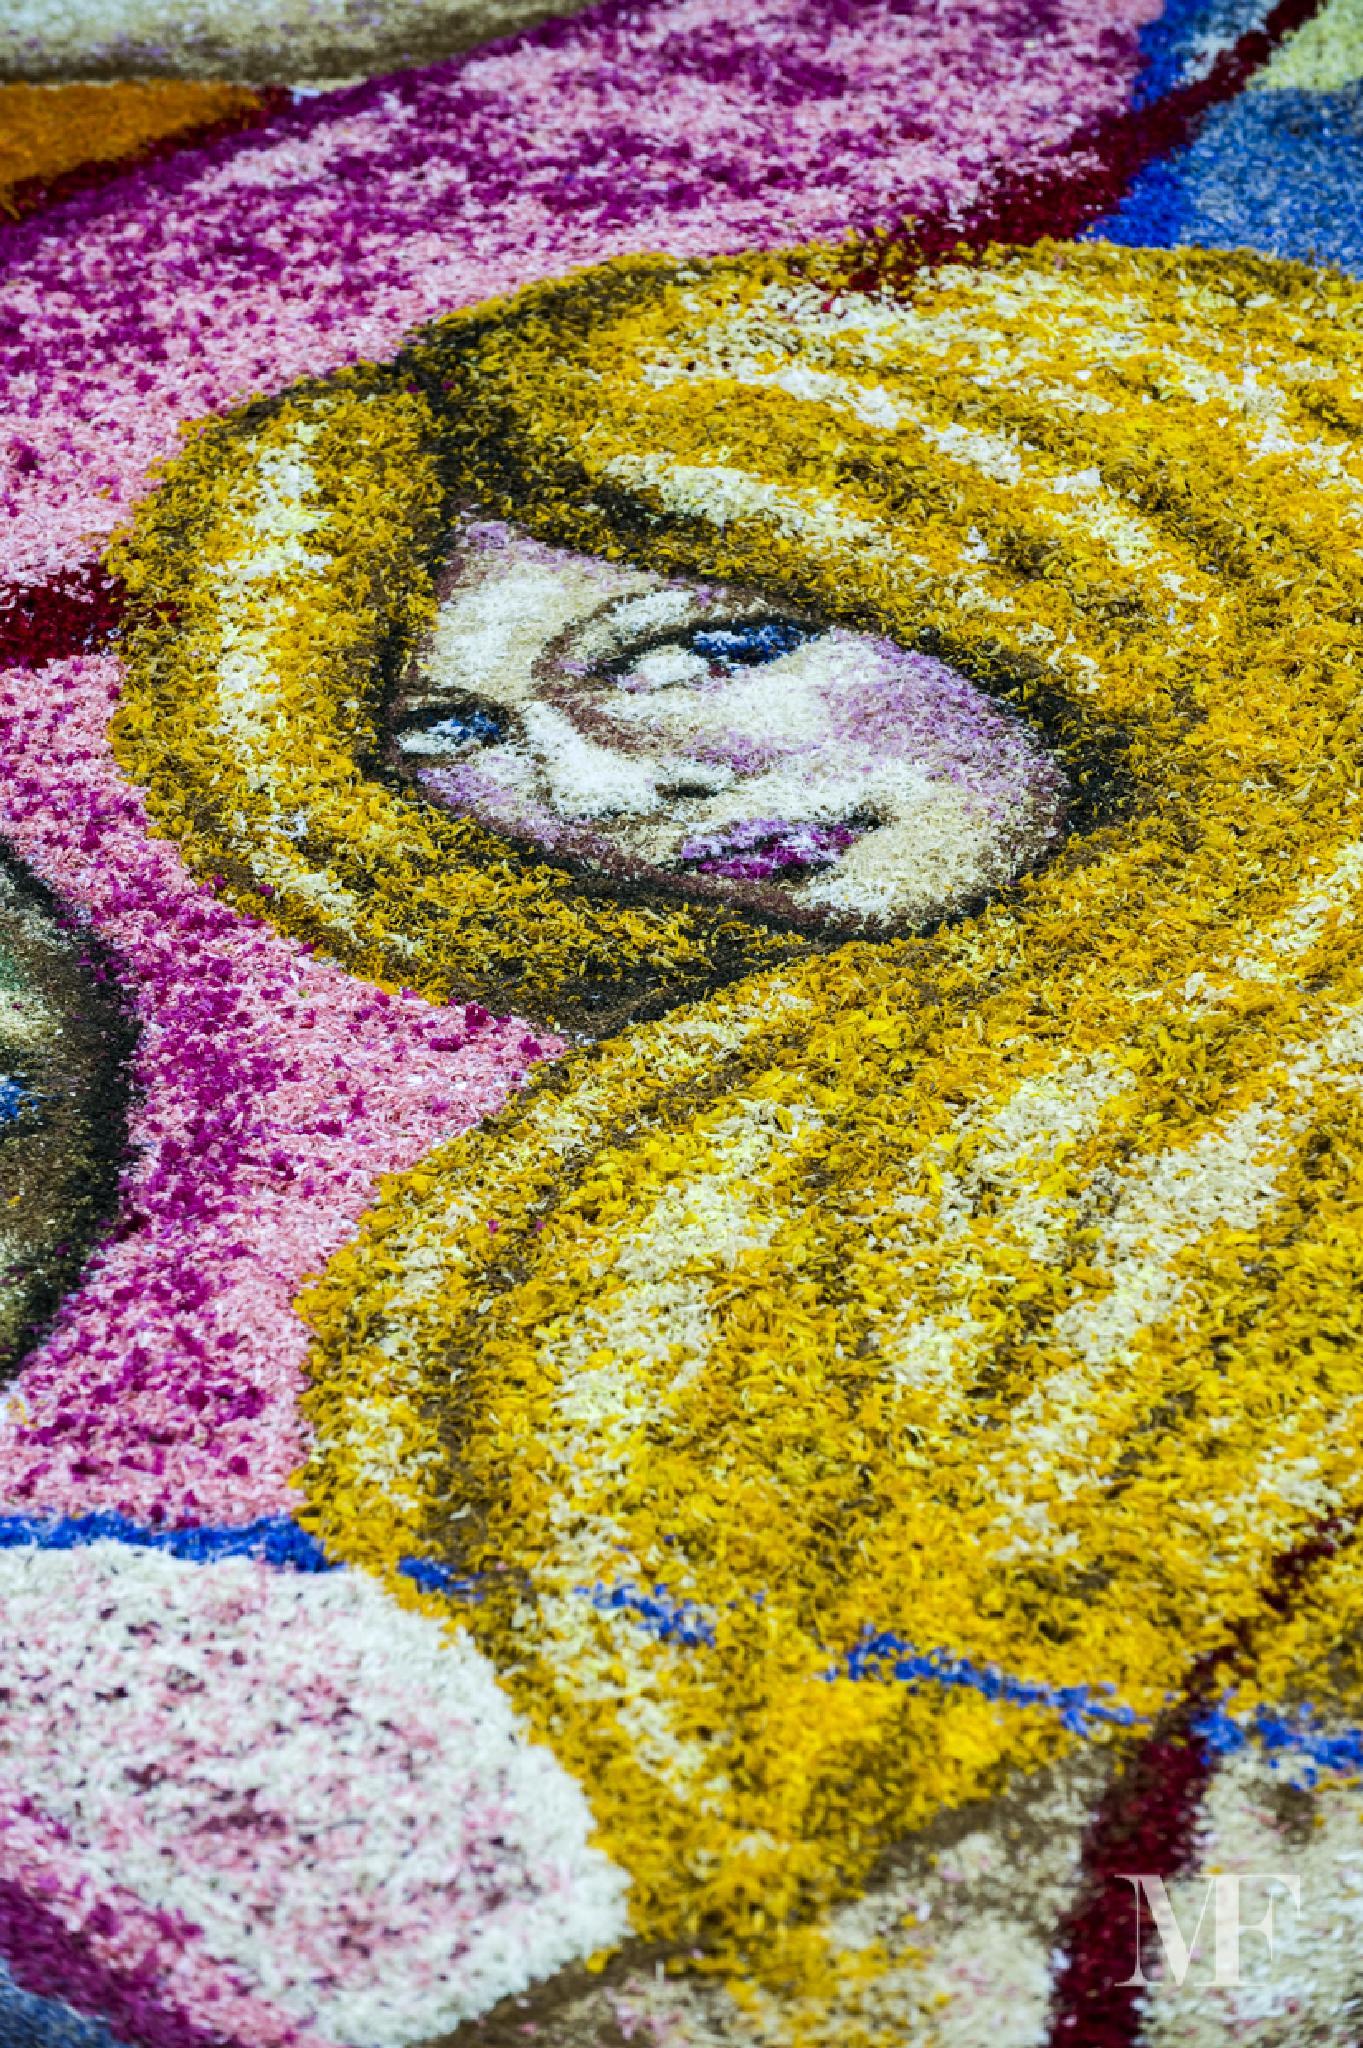 carpets of flowers truly unique E by moreno faina